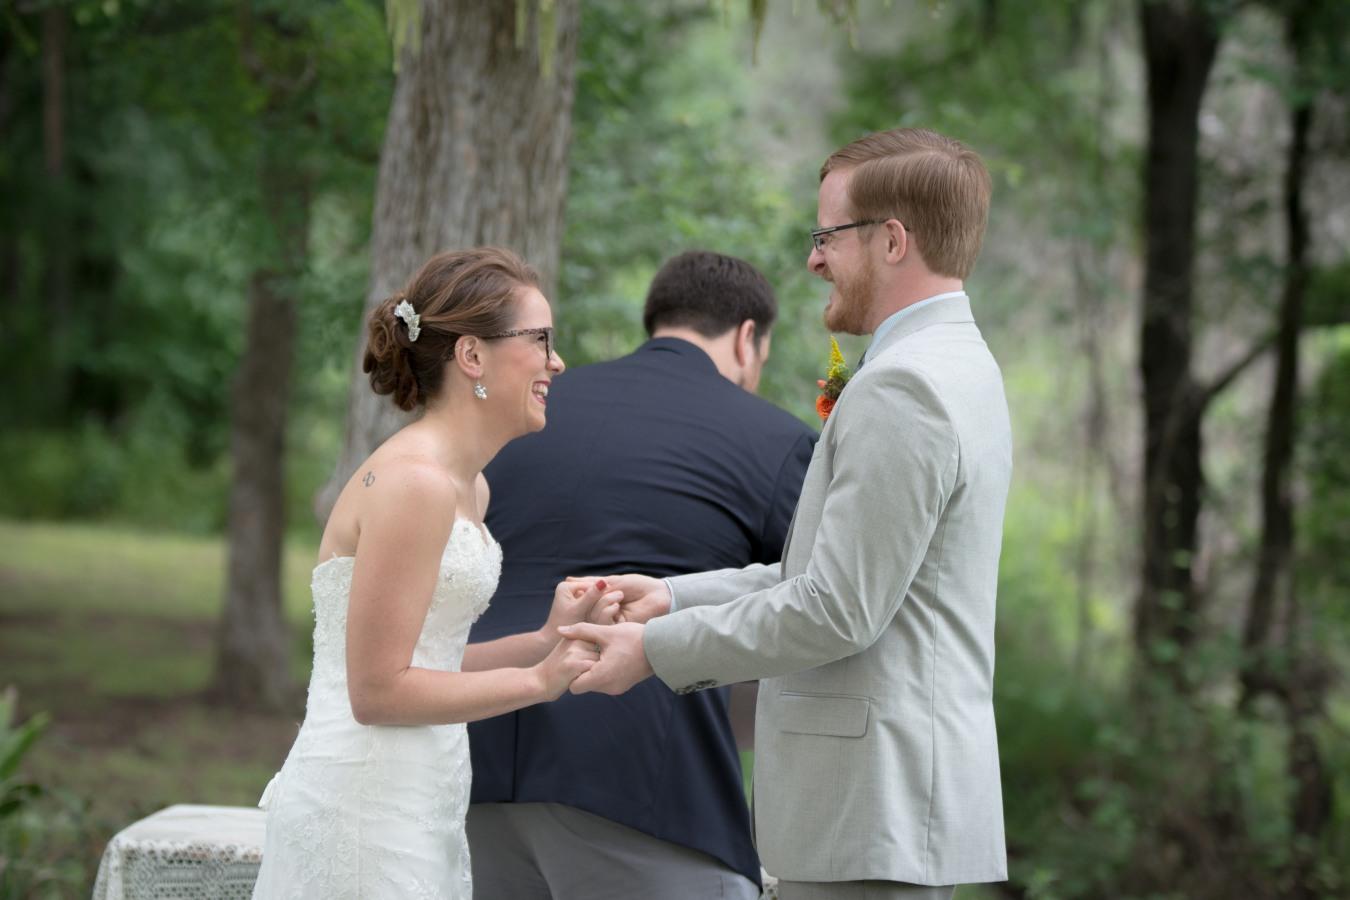 HighDot-Studios-Wedding-Cedar-Bend-Event-Center -Austin-Kim and Mike (31)